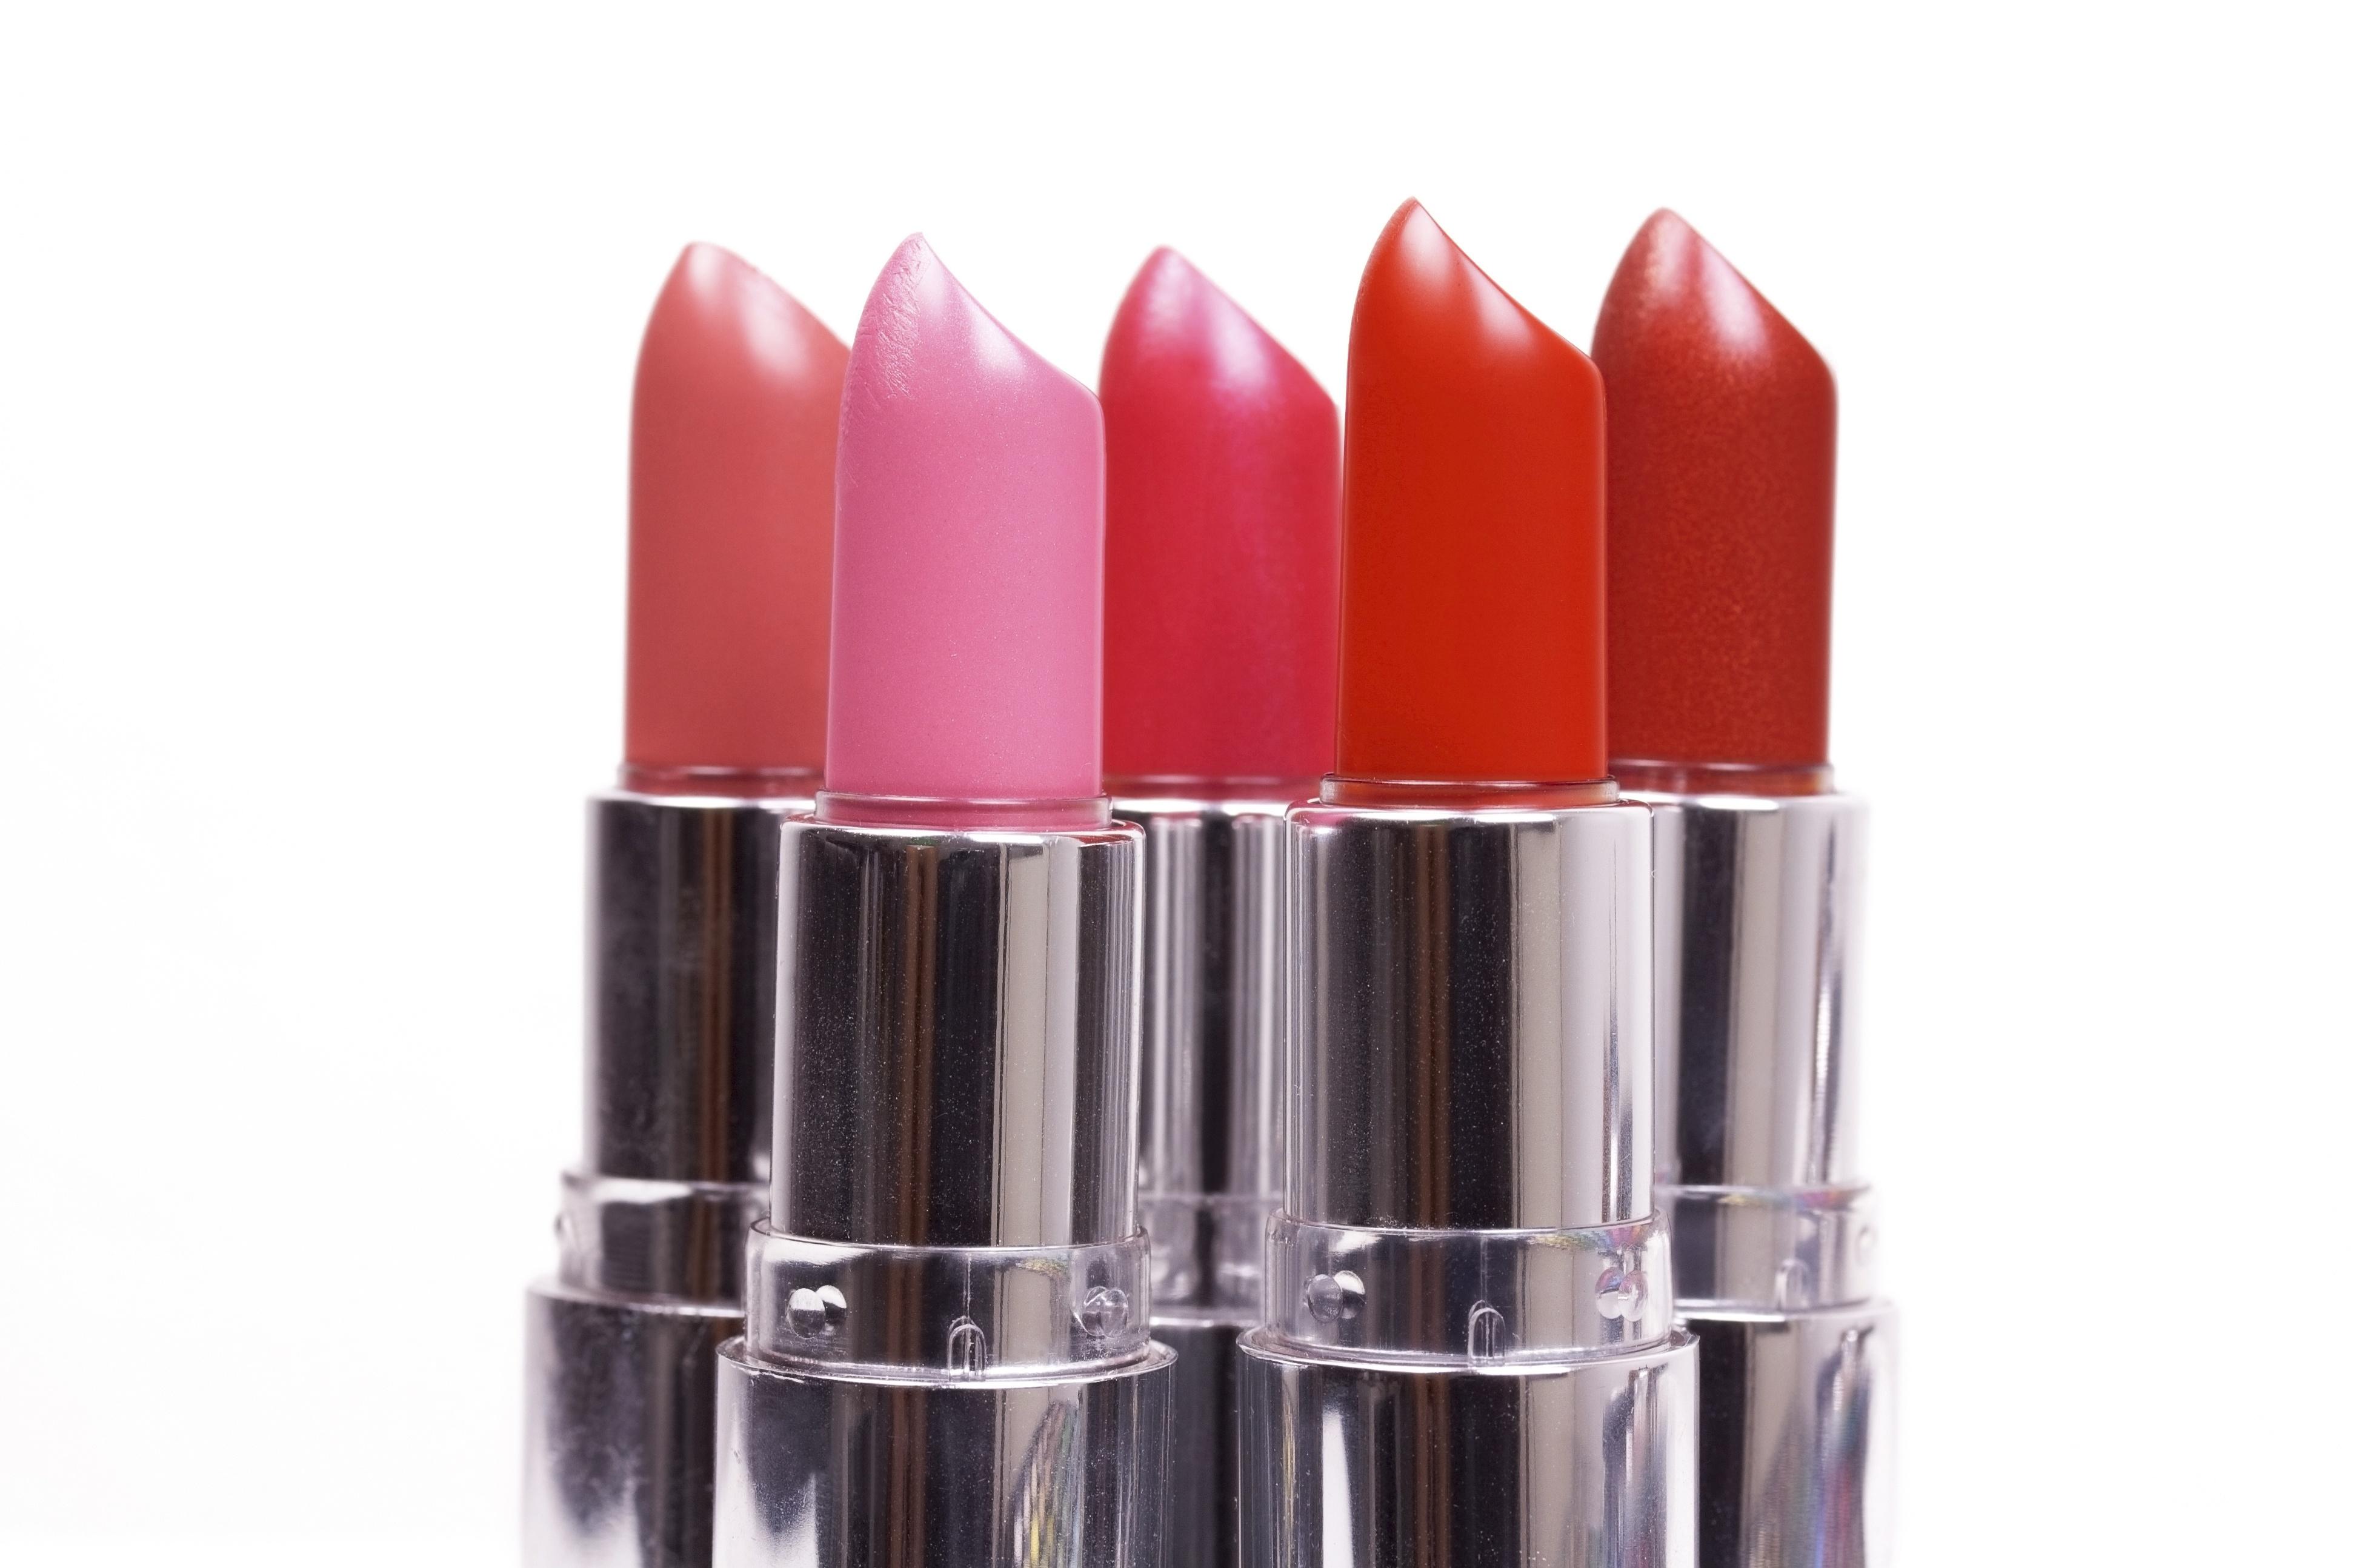 lipsticks, 3 lipsticks that make your teeth pop, ravishing reds, poppy pinks, glosses, oral health, beauty, dental health